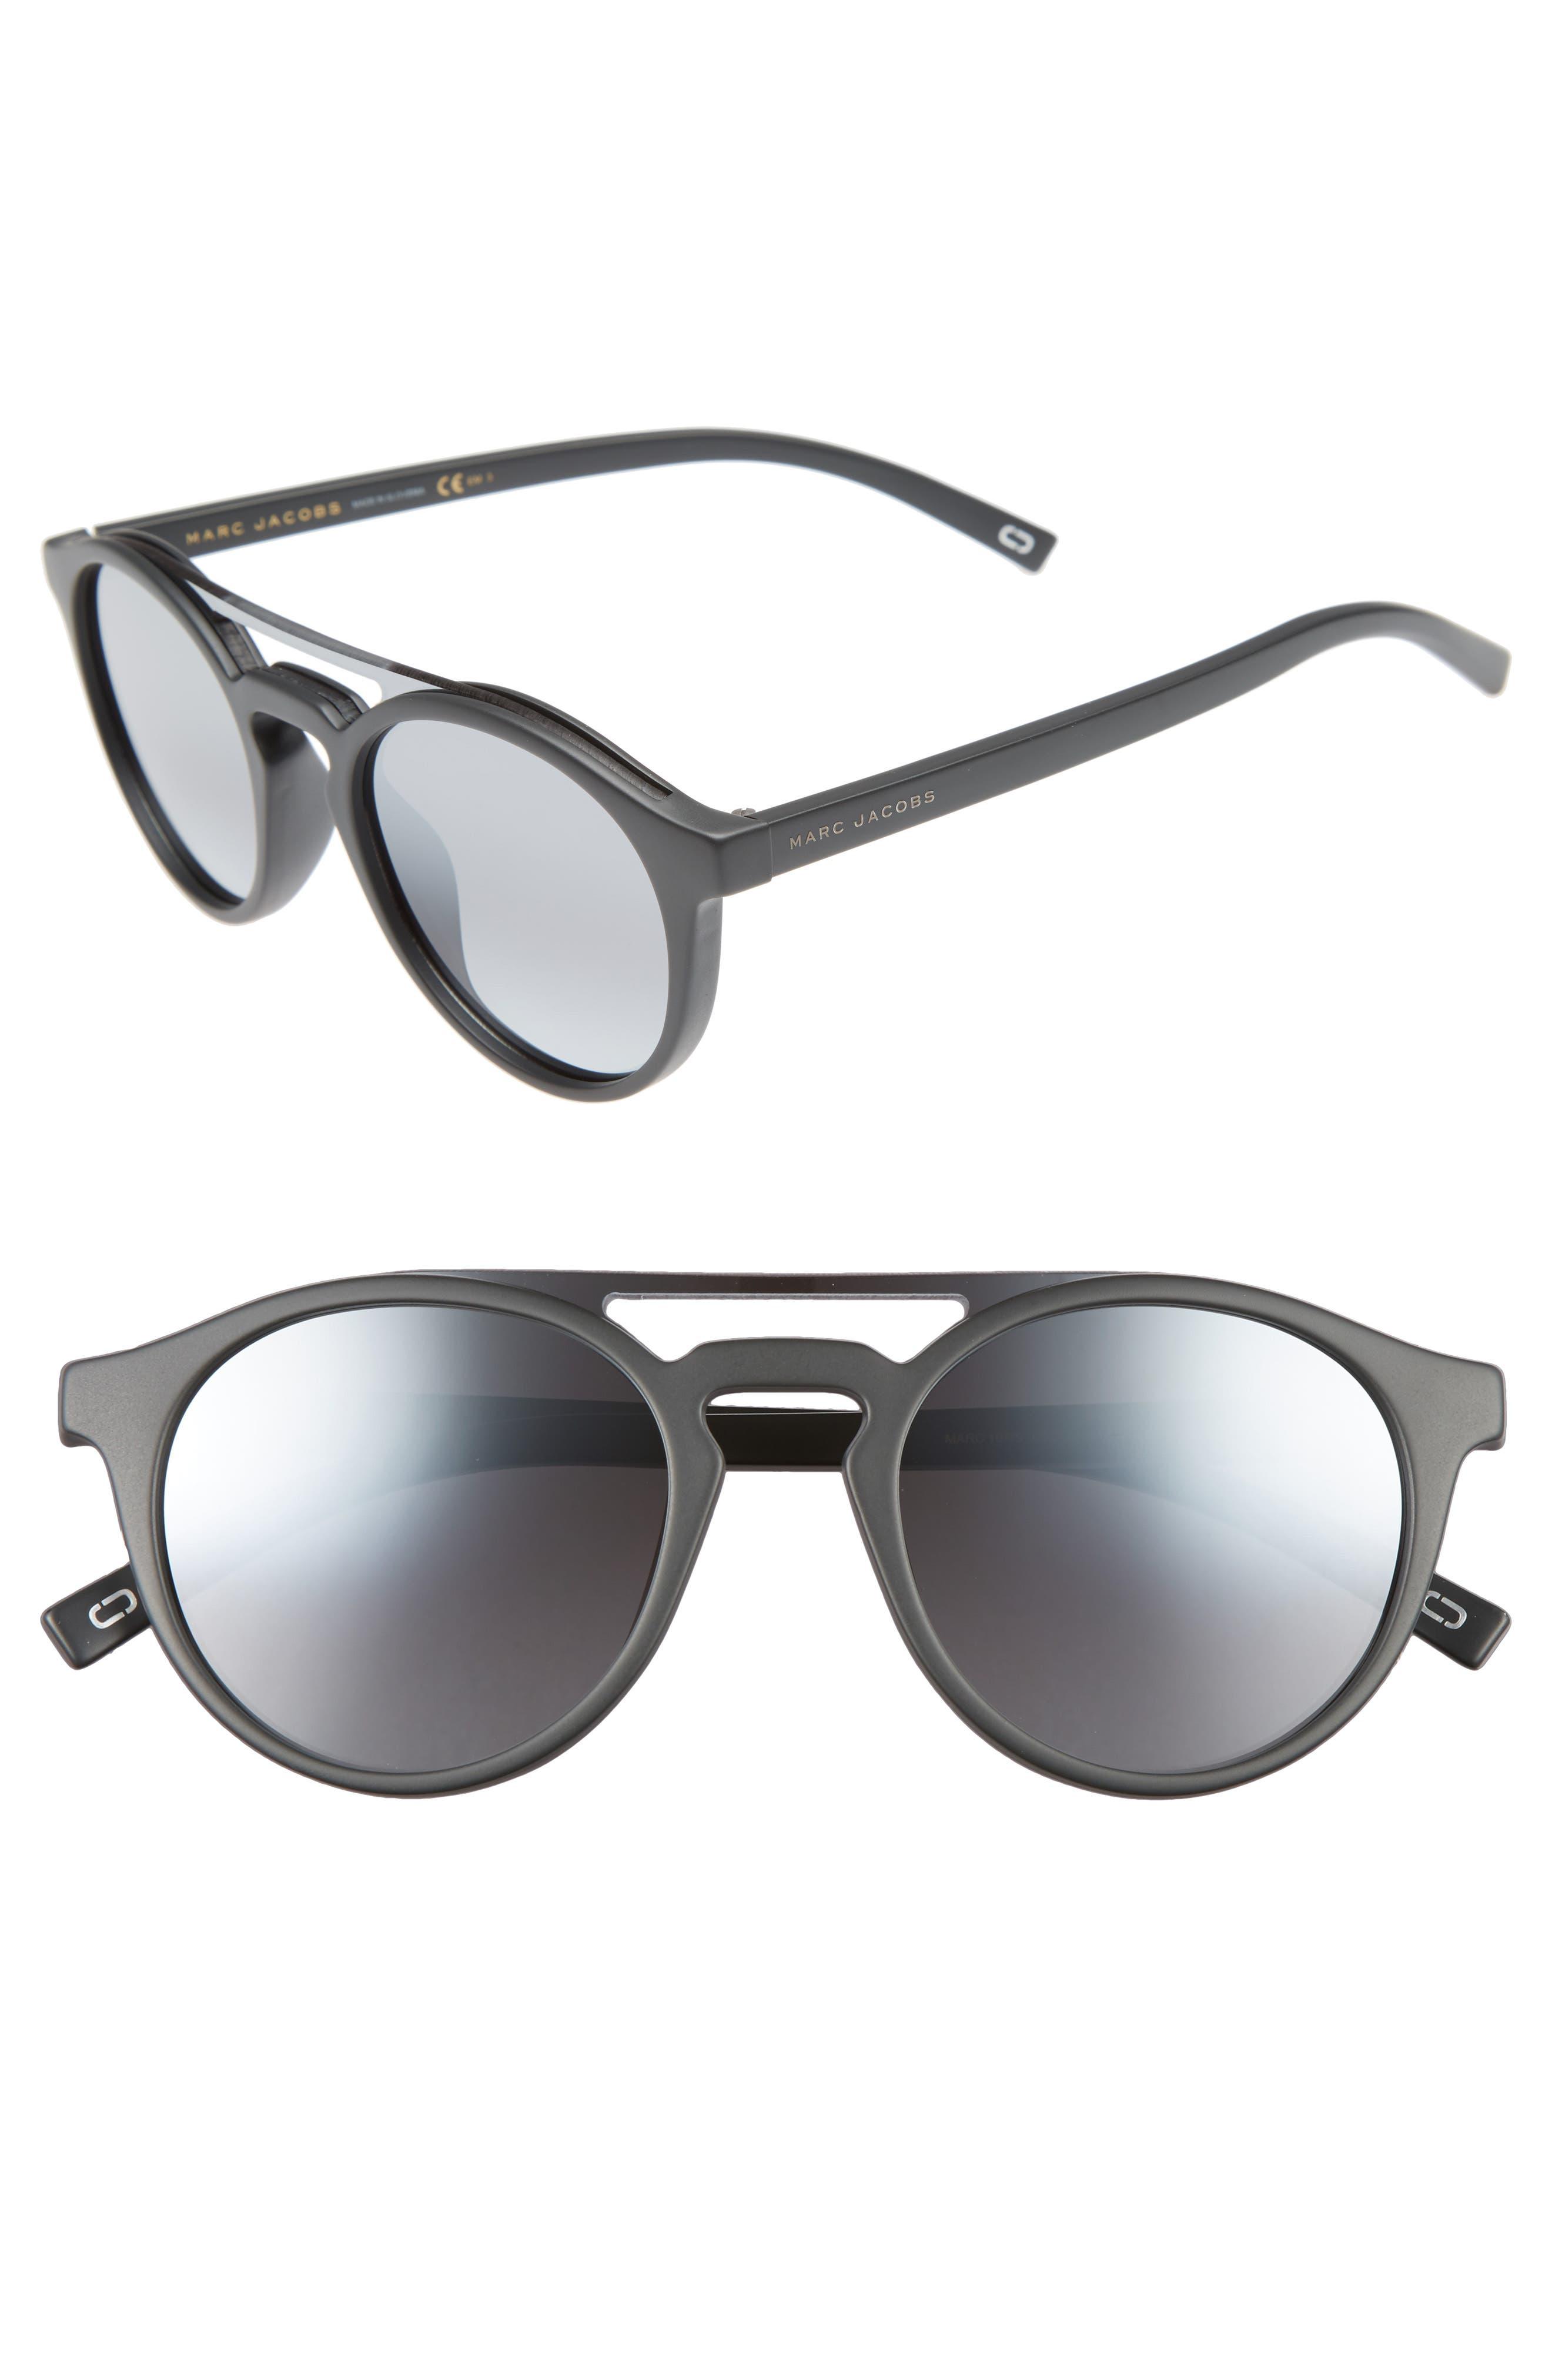 99mm Round Brow Bar Sunglasses,                         Main,                         color, 021